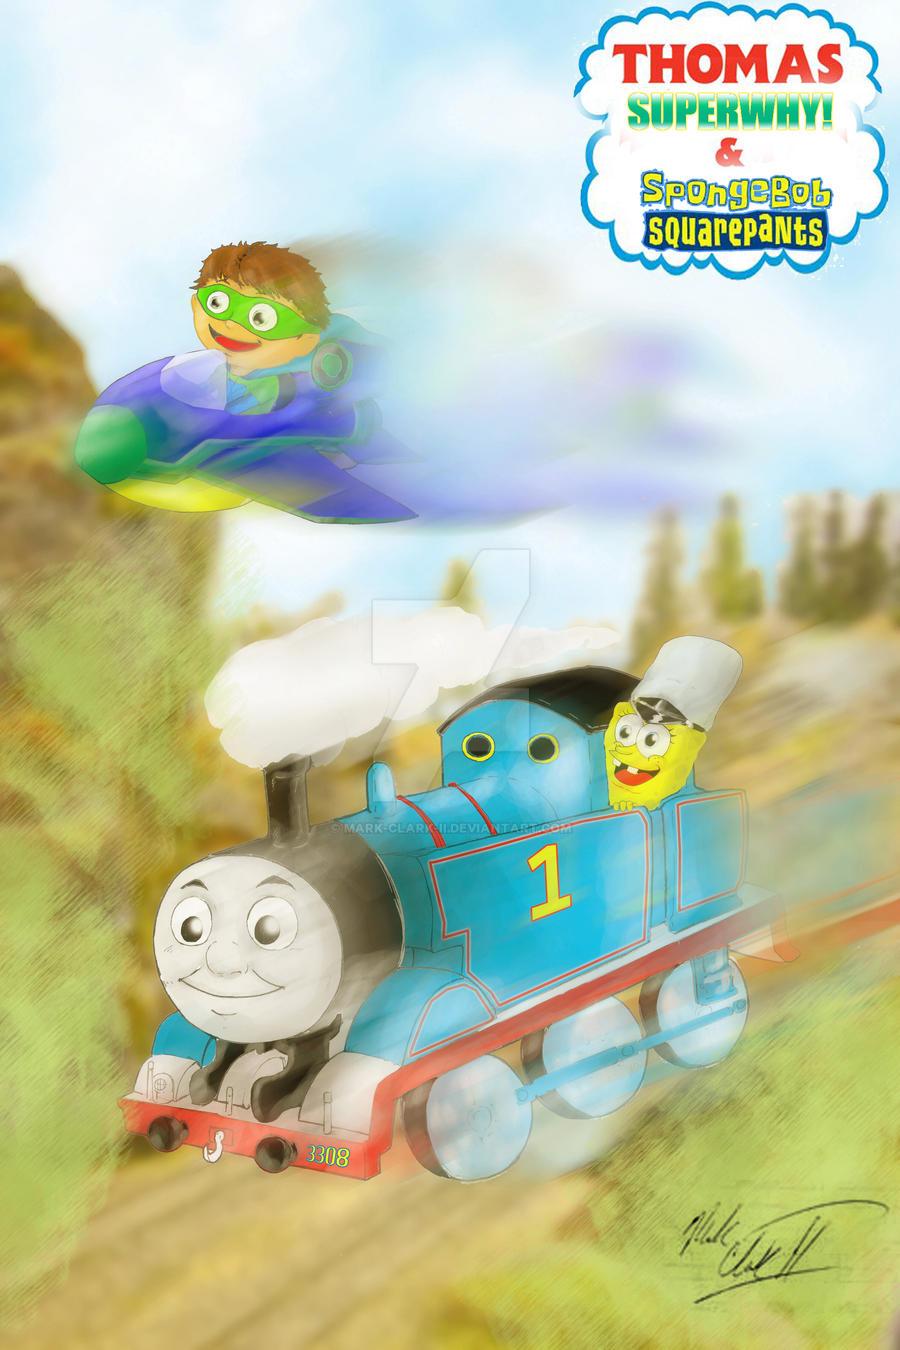 Thomas SuperWhy  Spongebob by Mark-Clark-II